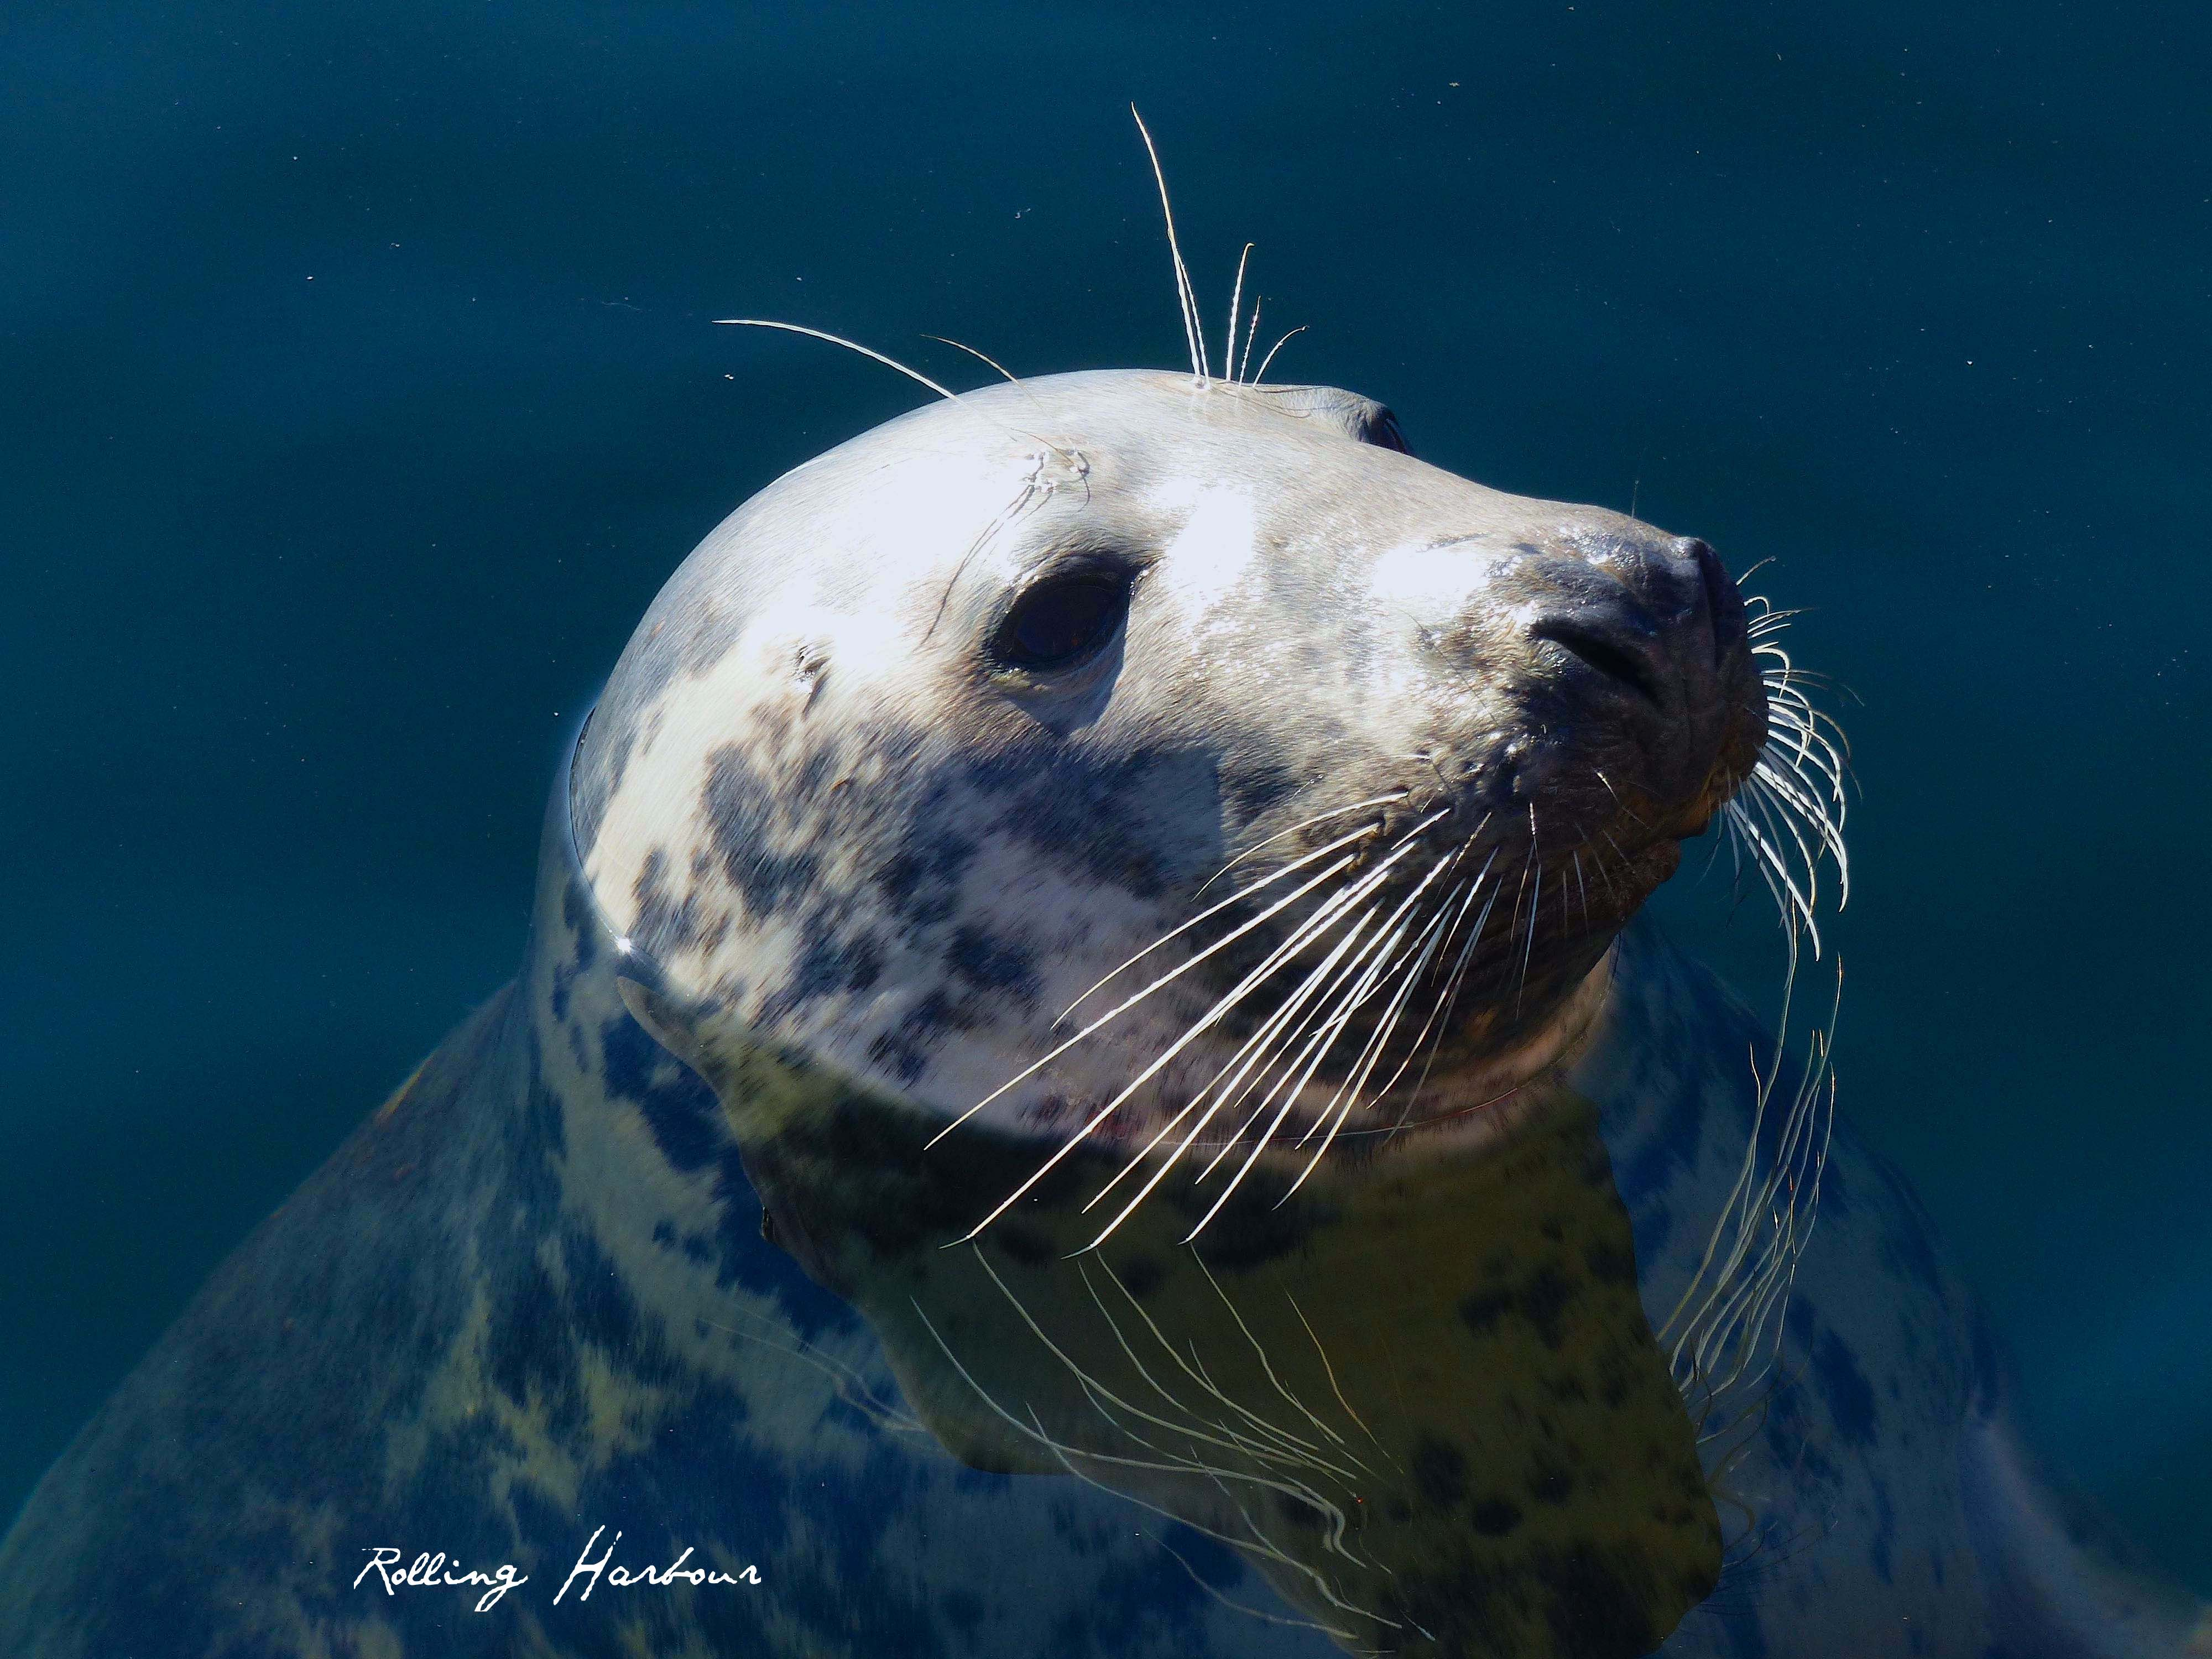 Harbour Seal, Gairloch Scotland (Keith Salvesen / Rolling Harbour)